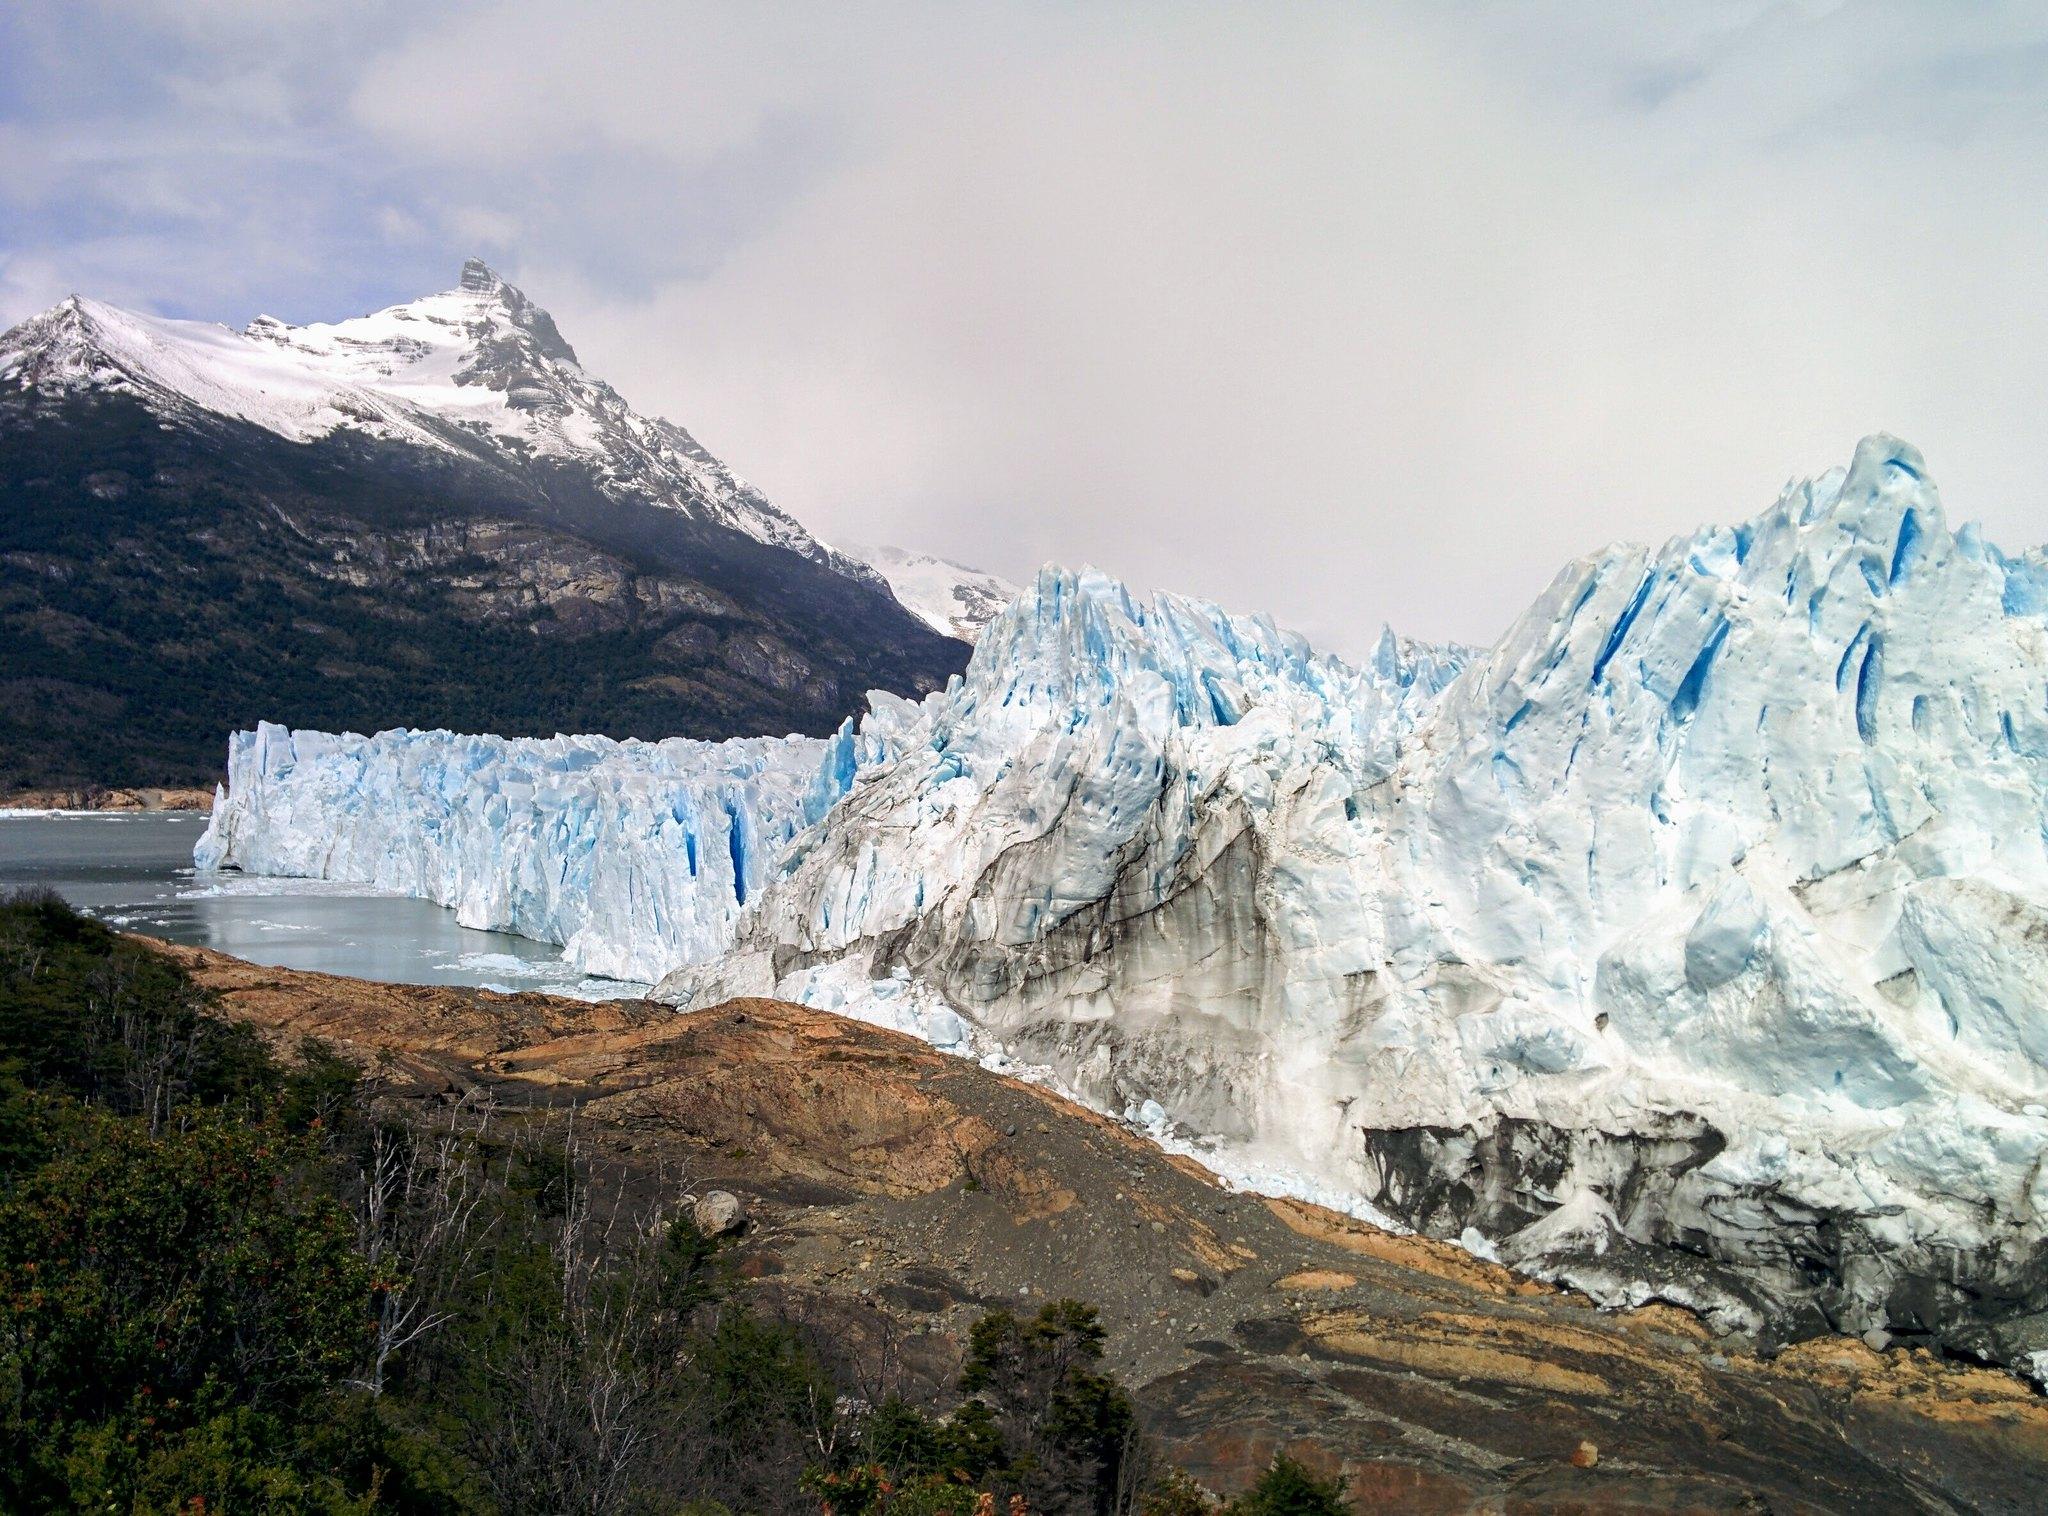 Glaciar Perito Moreno looking south